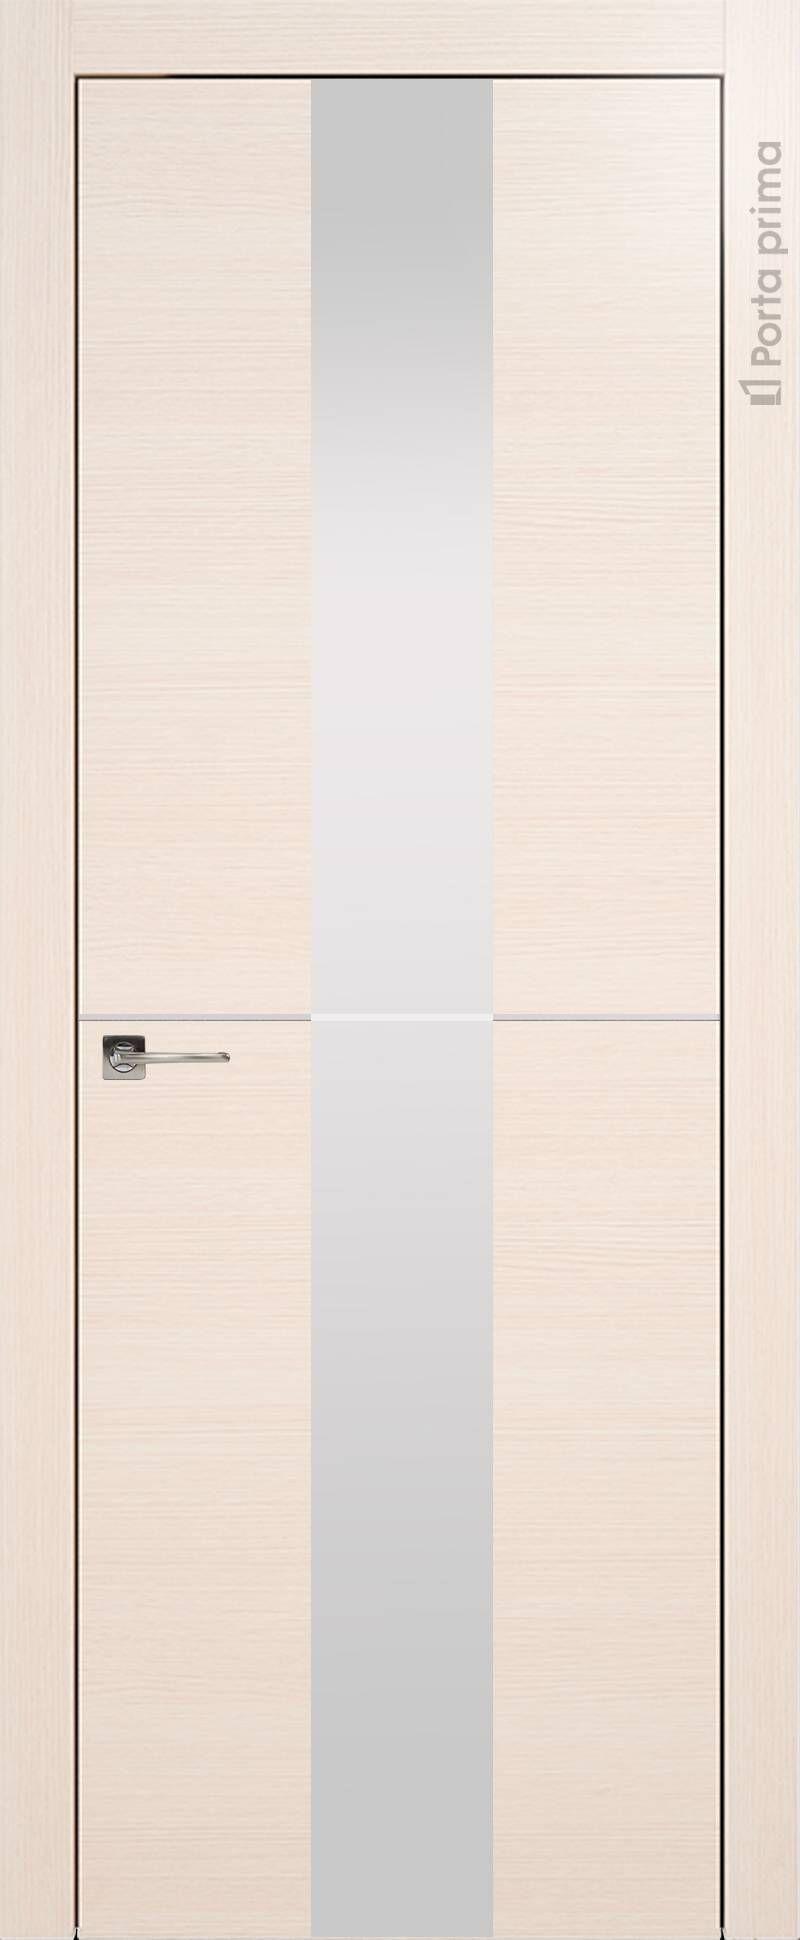 Tivoli Ж-3 цвет - Беленый дуб Со стеклом (ДО)